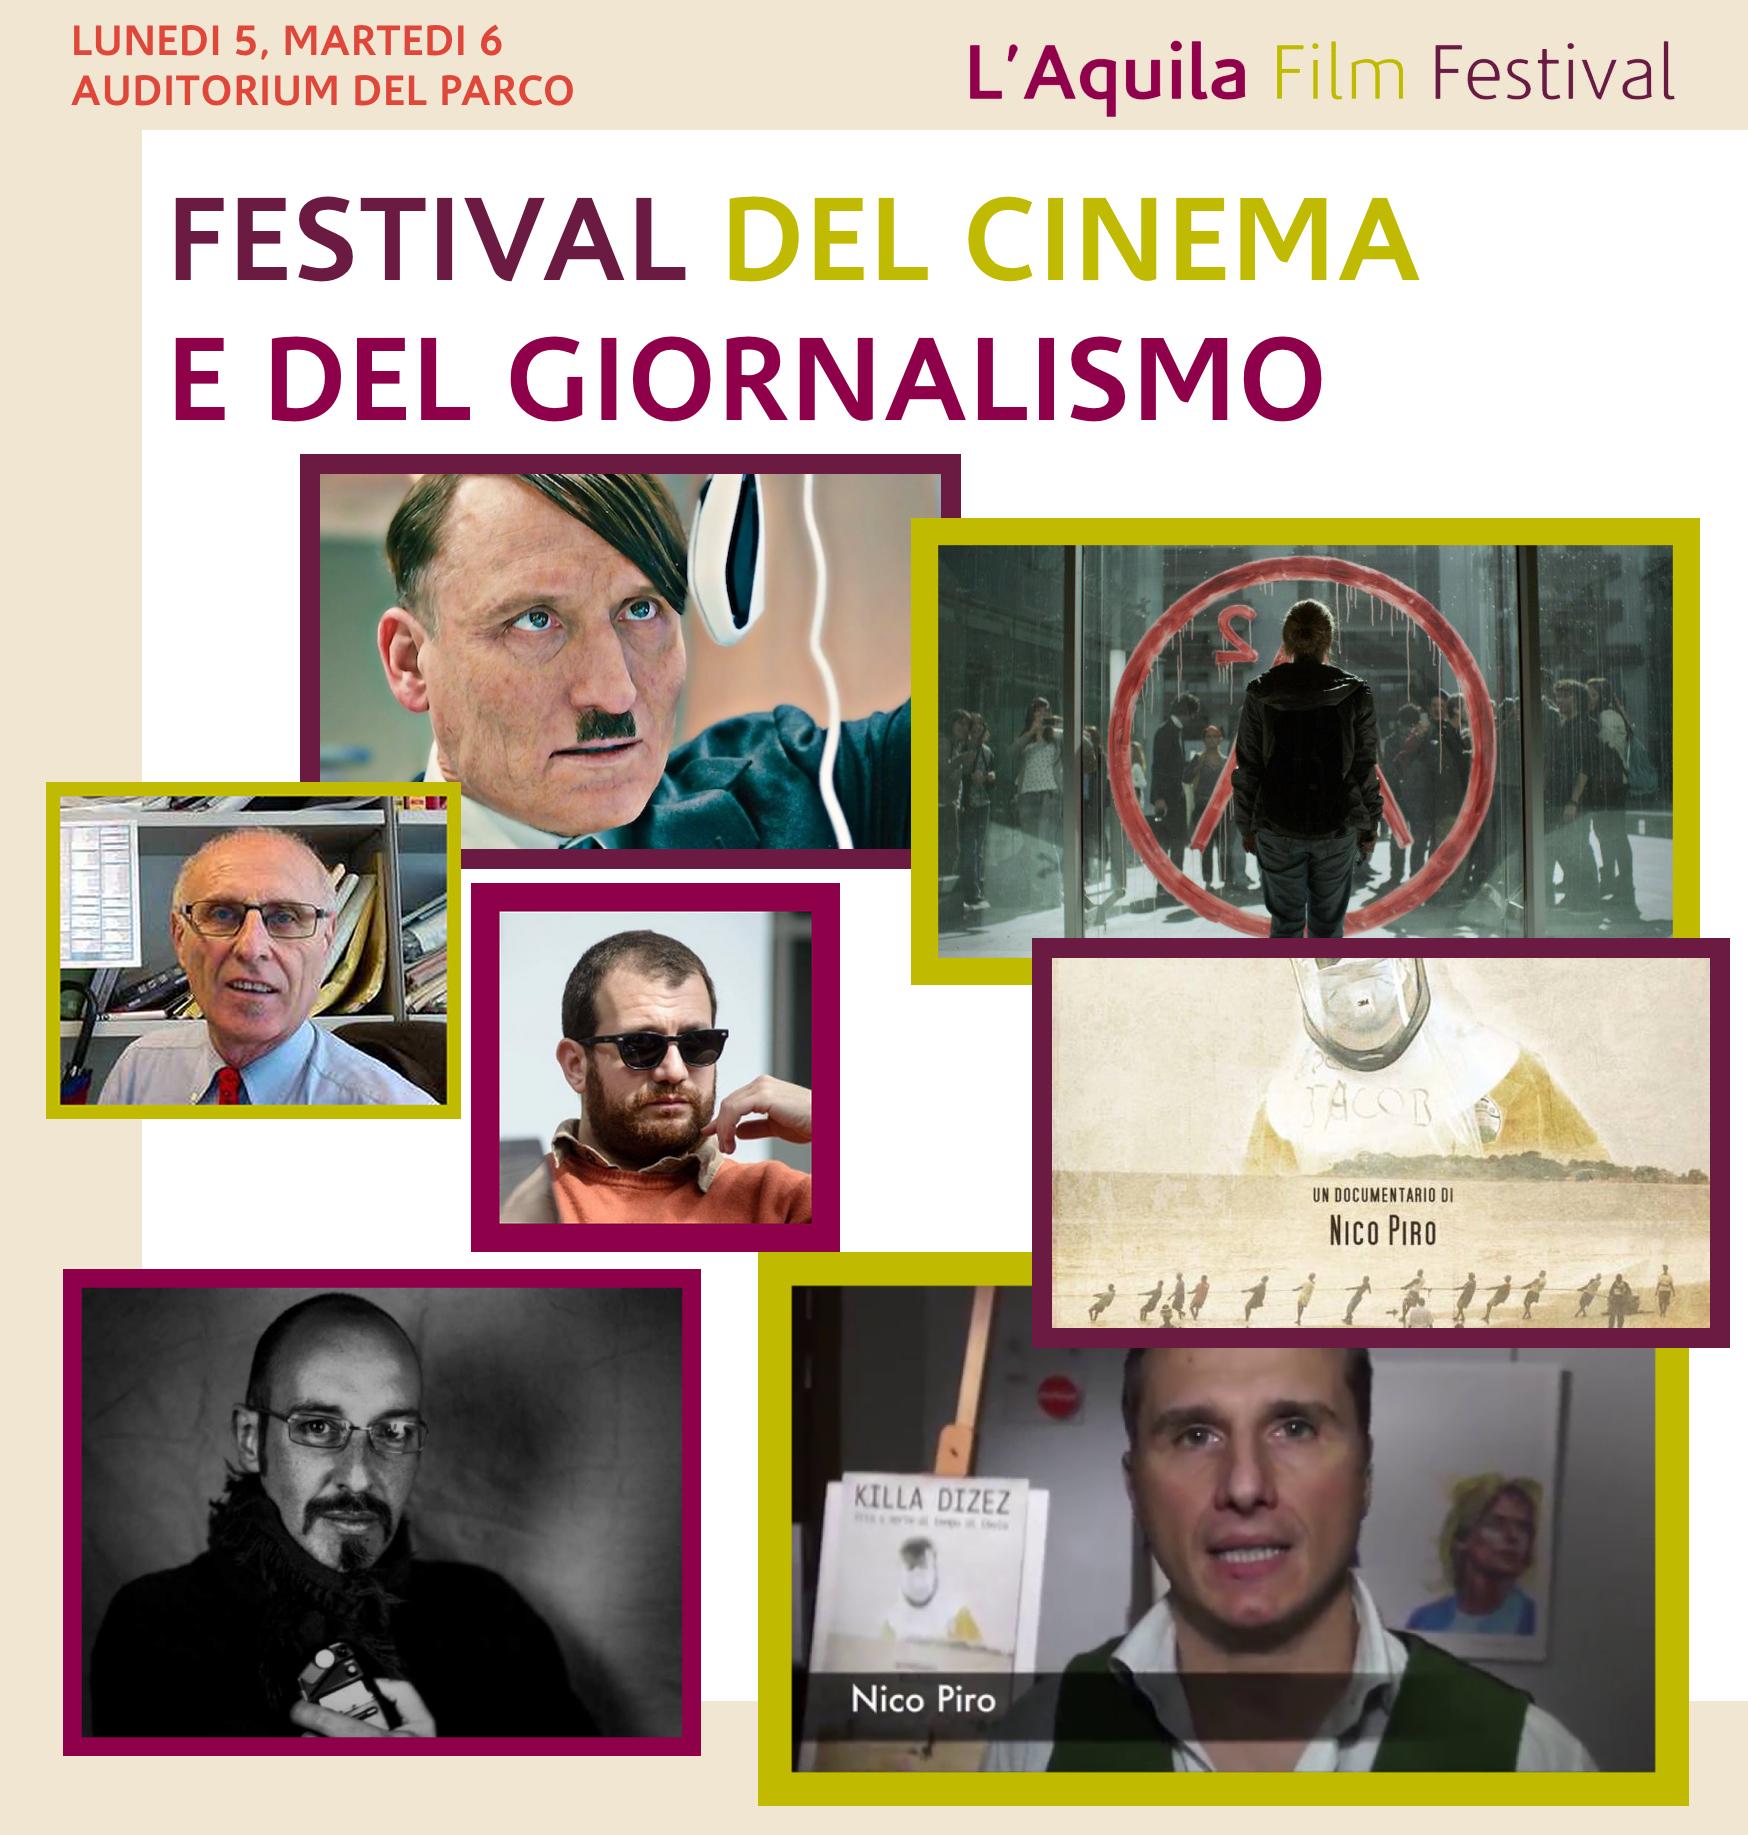 festivaldelgiornalismo